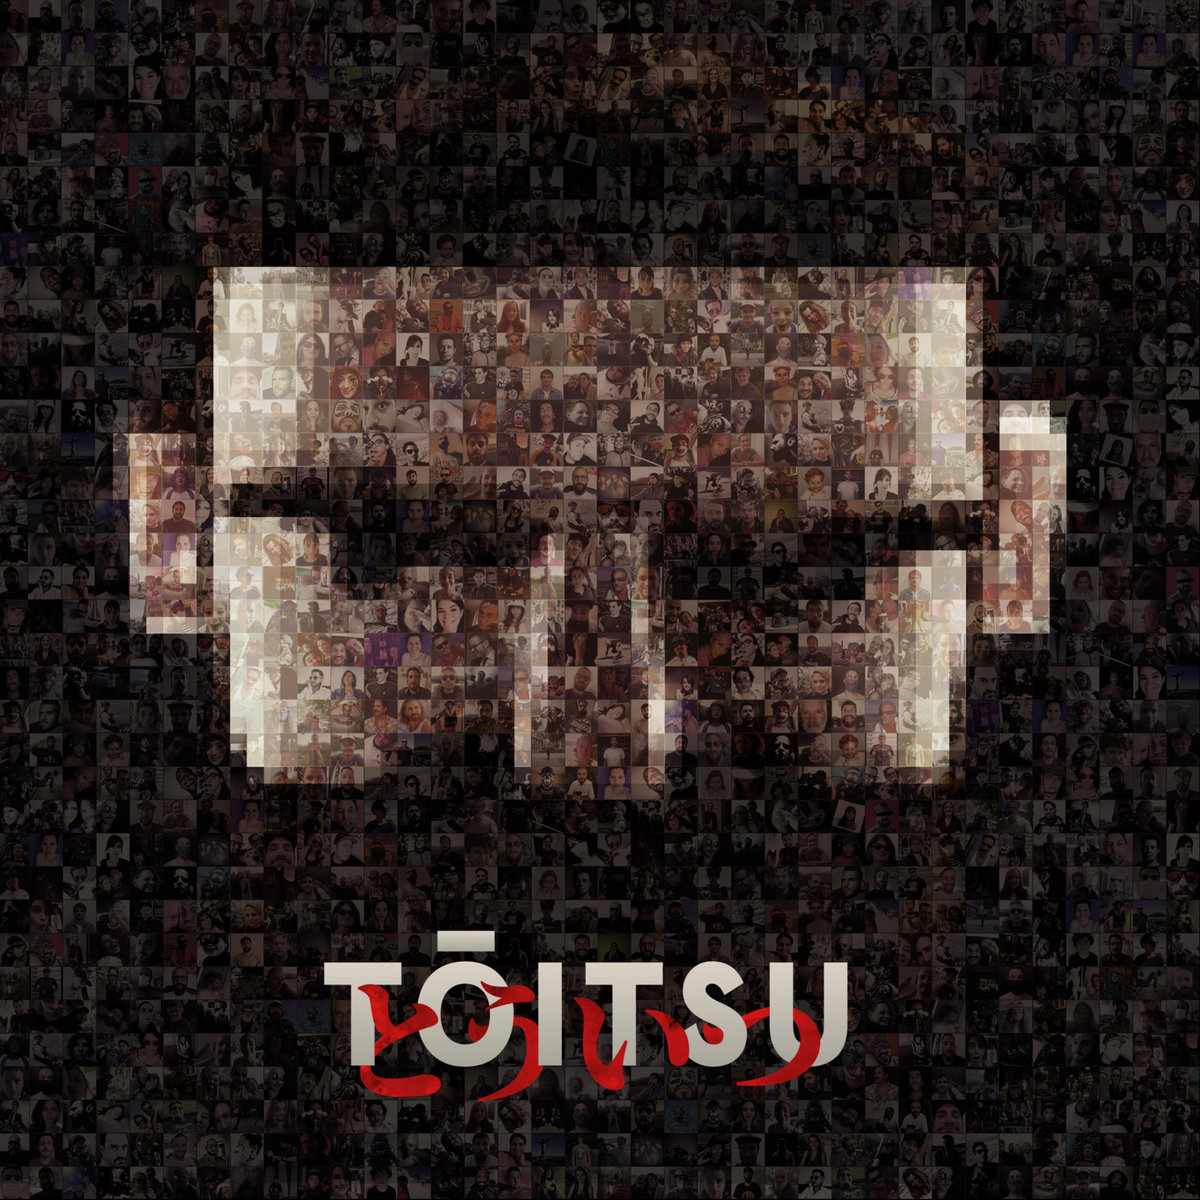 Senbeï Tōitsu